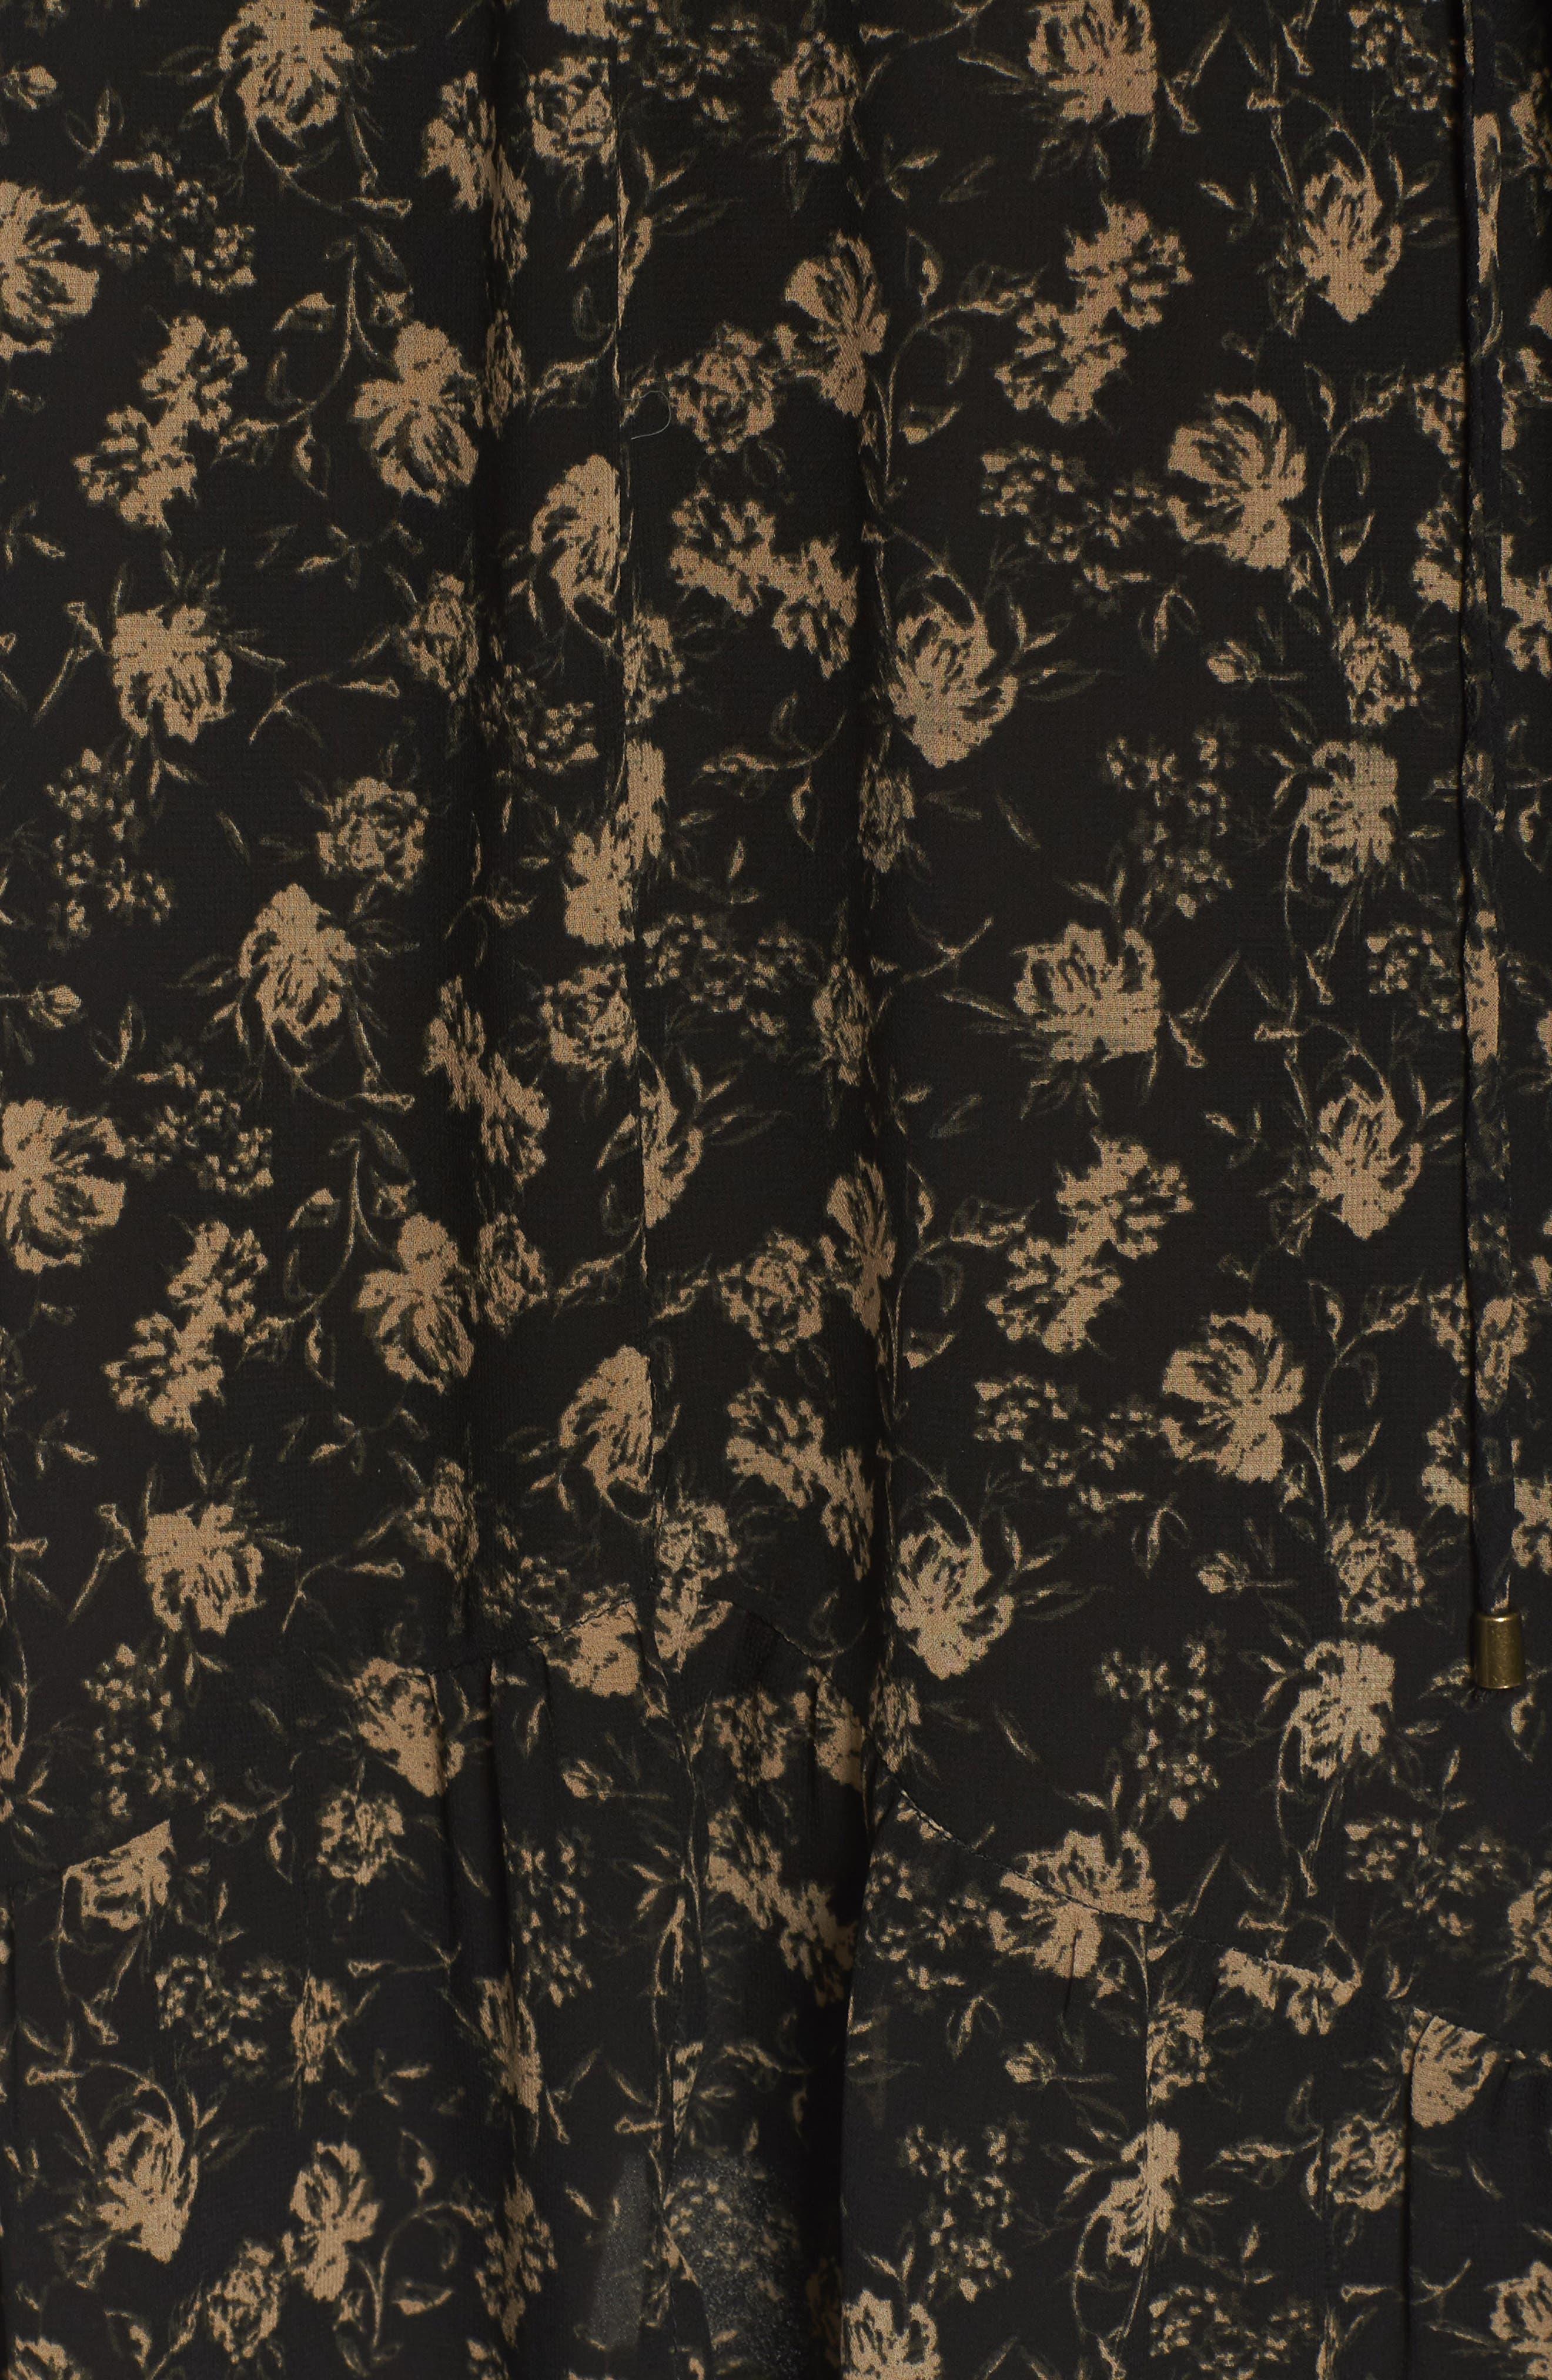 Ambrosia Shift Dress,                             Alternate thumbnail 6, color,                             Black-Tan Floral